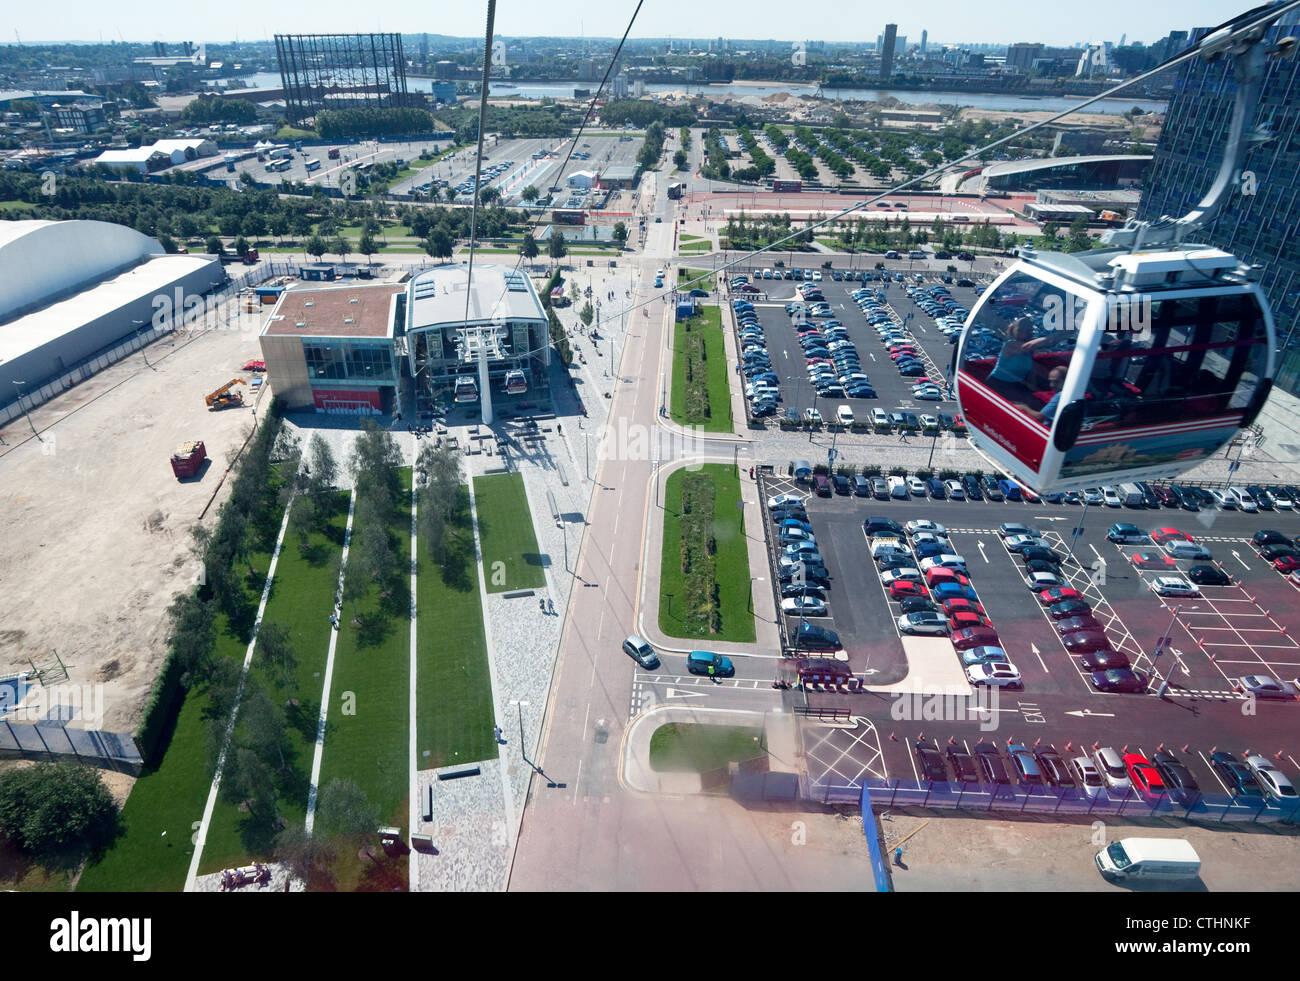 Emirates Greenwich Peninsula Car Park